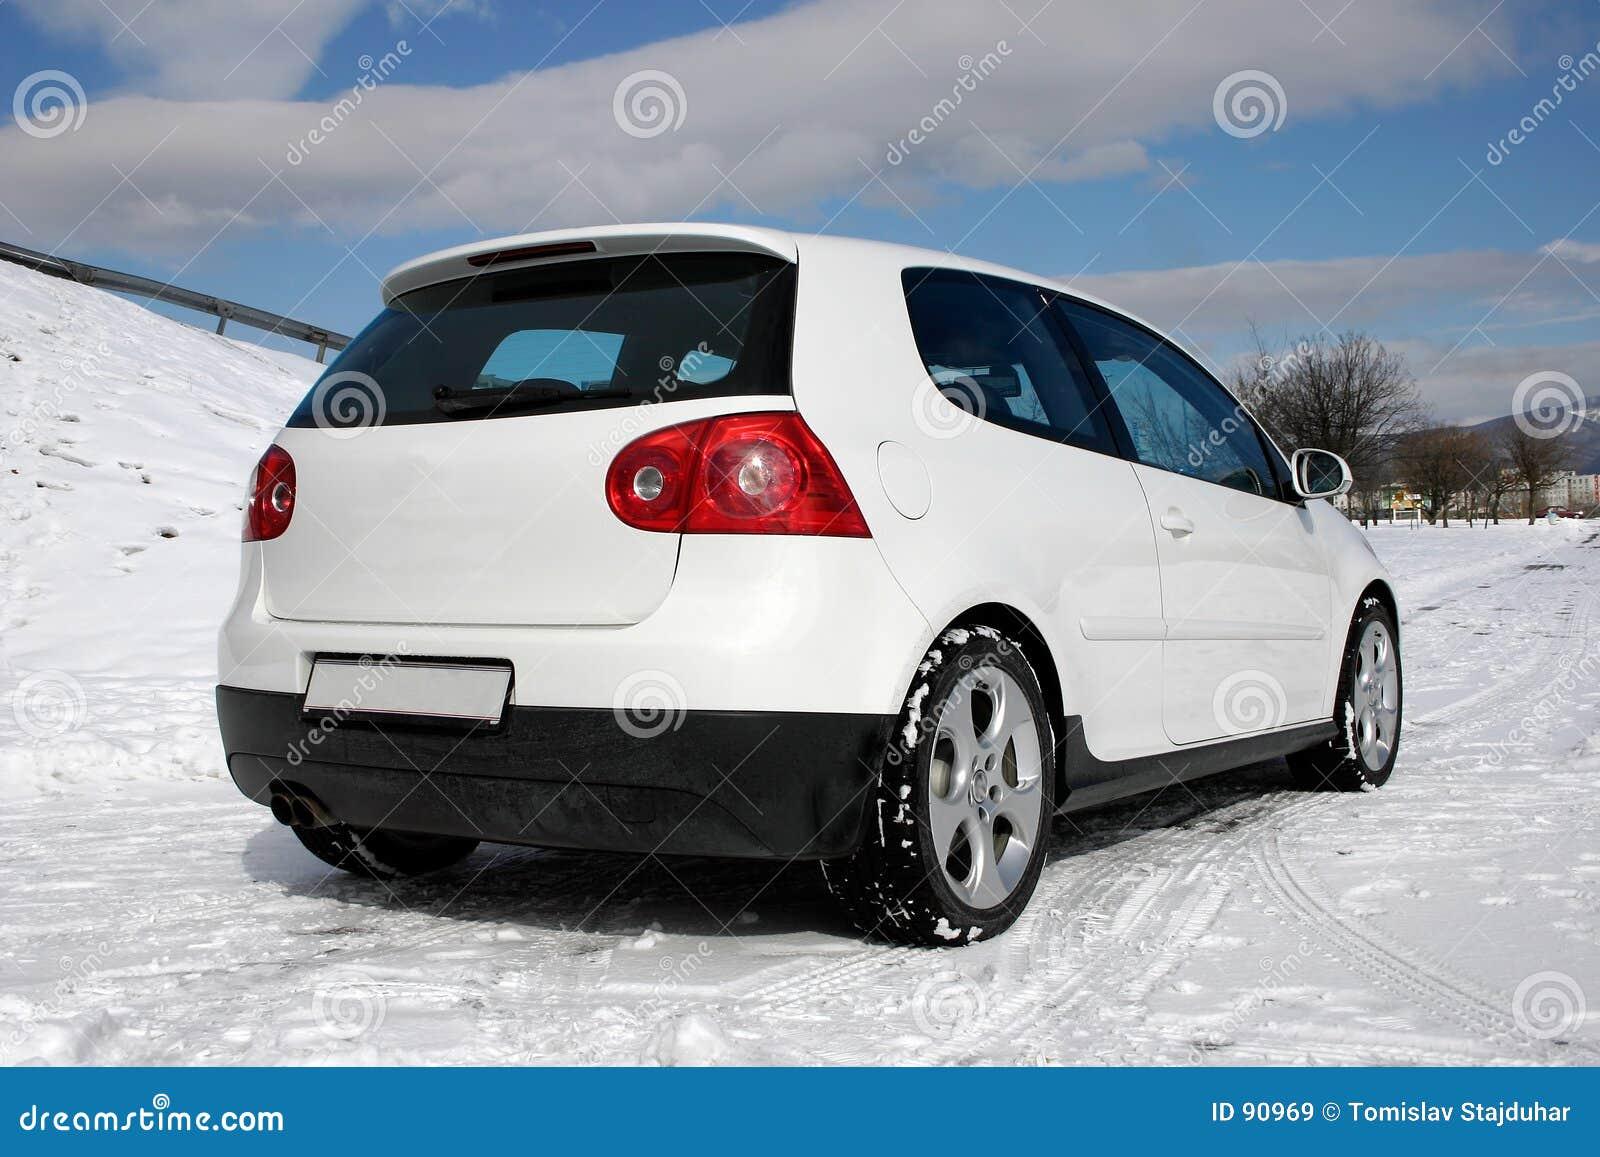 VW golf gti rear stock image. Image of generation, german - 90969